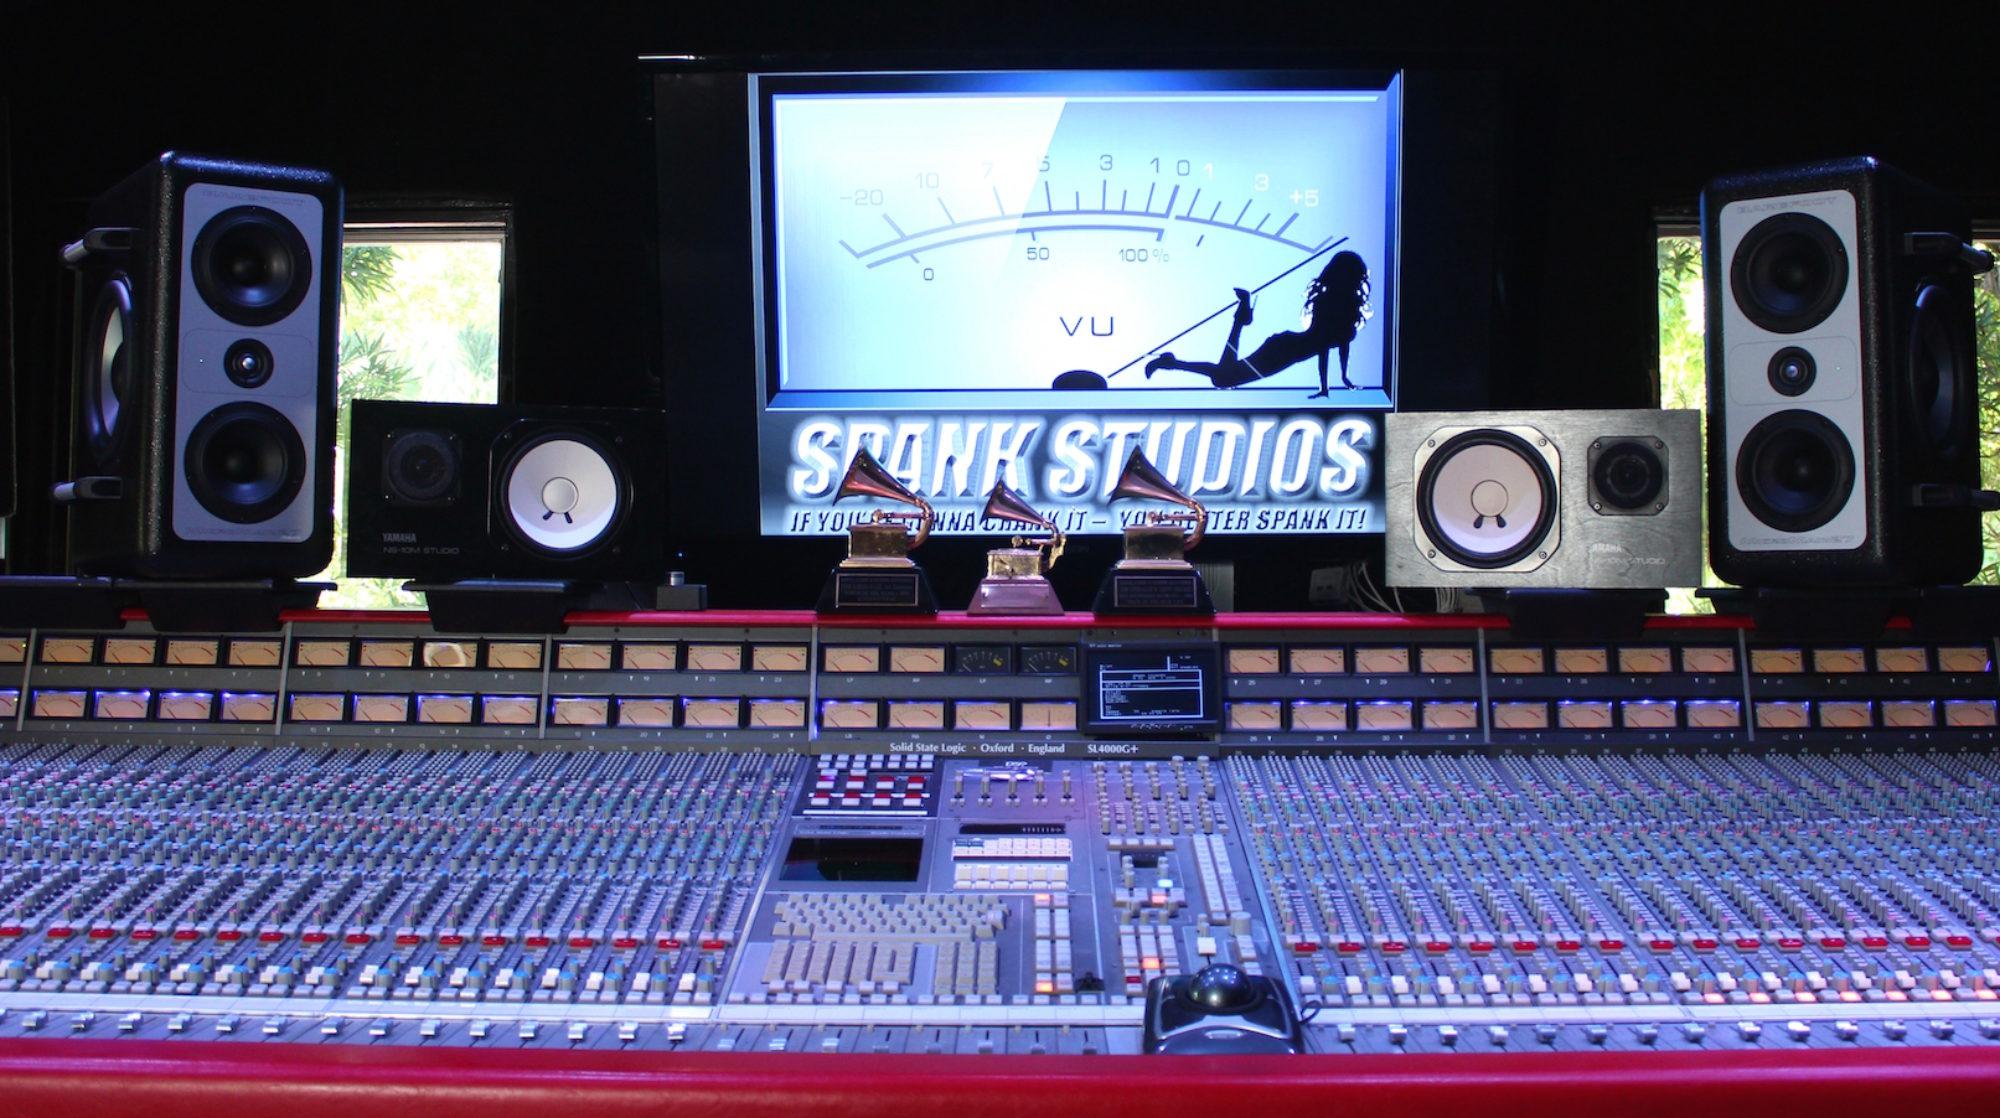 Spank Studios